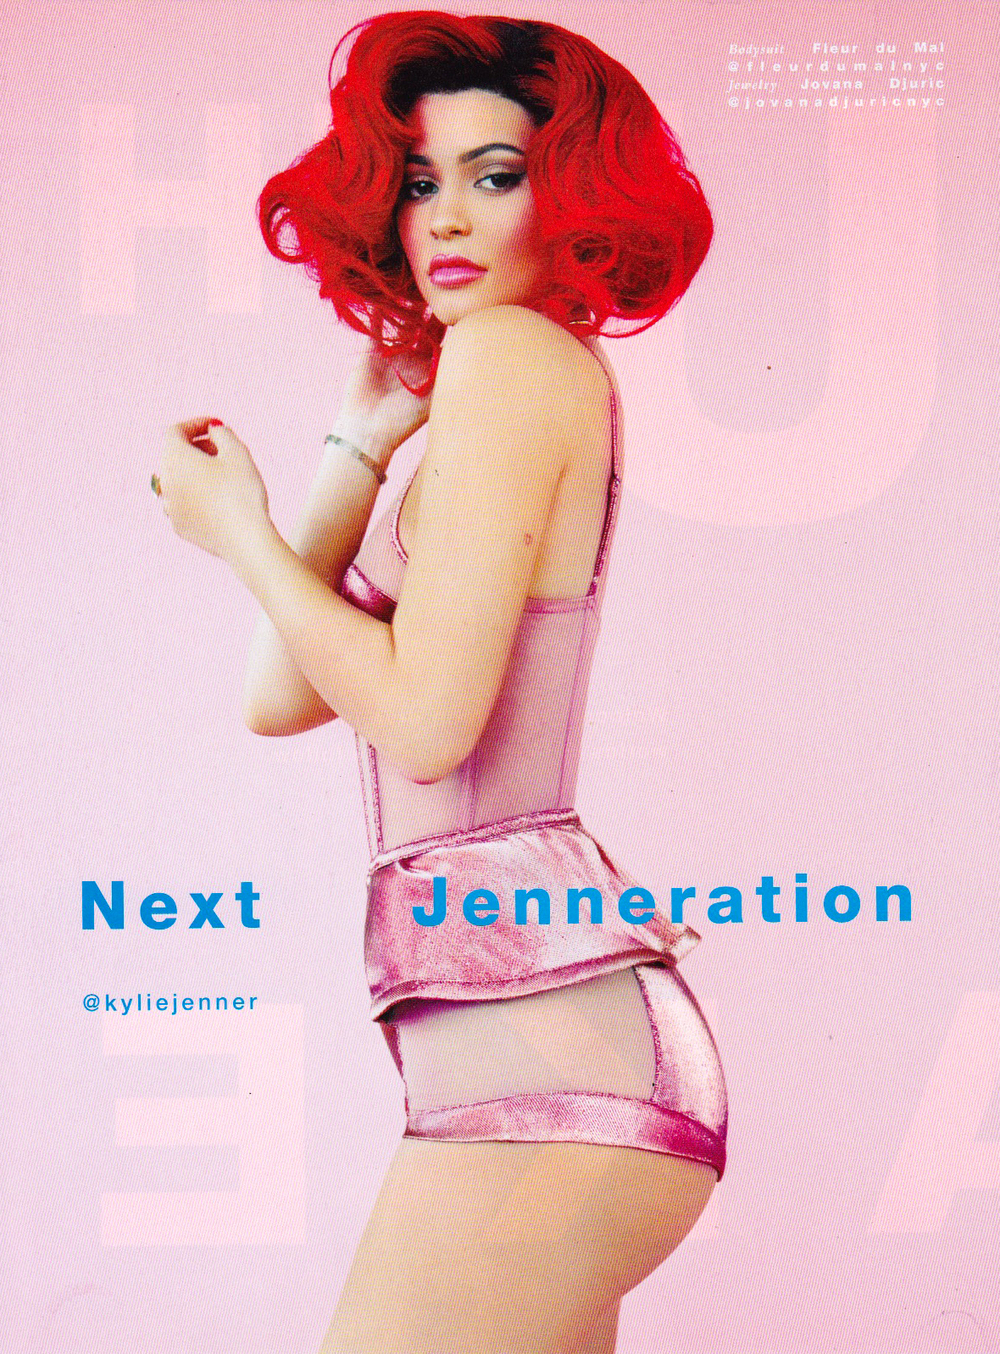 PAPER MAG Jovana Djuric Kylie Jenner 2.jpeg